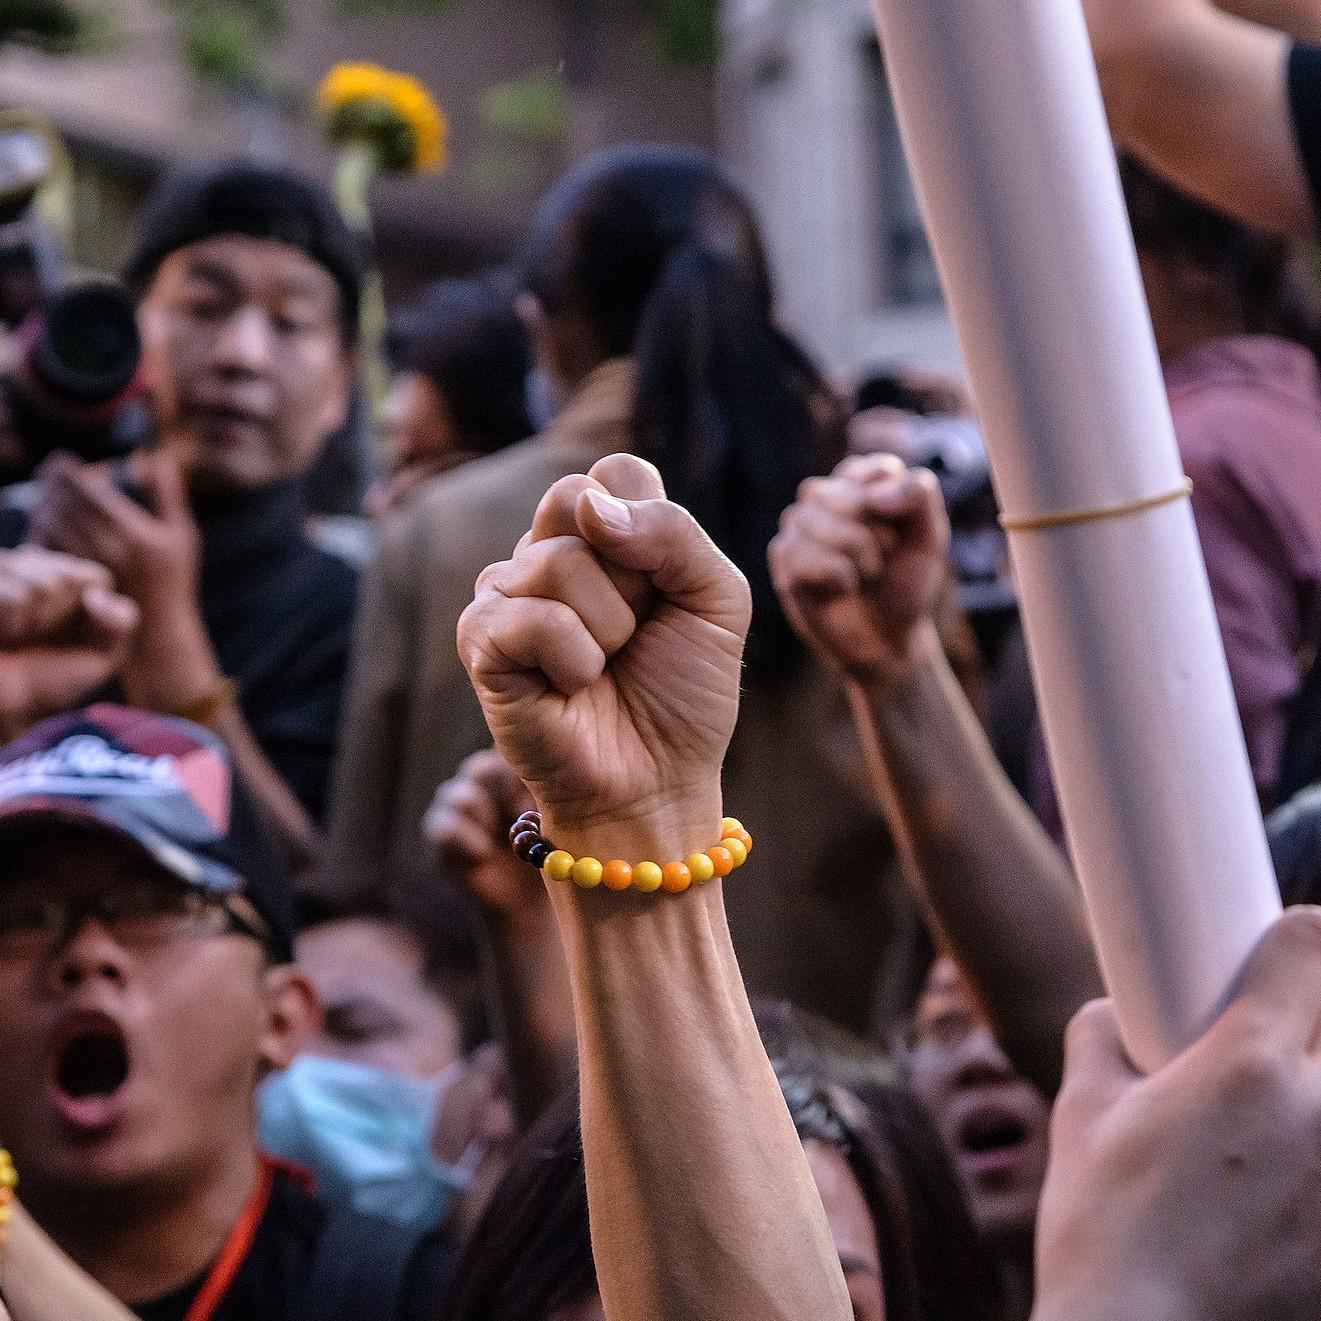 Students mass protest taiwan image by artemas liu cc by 2.0 via wikimedia commons